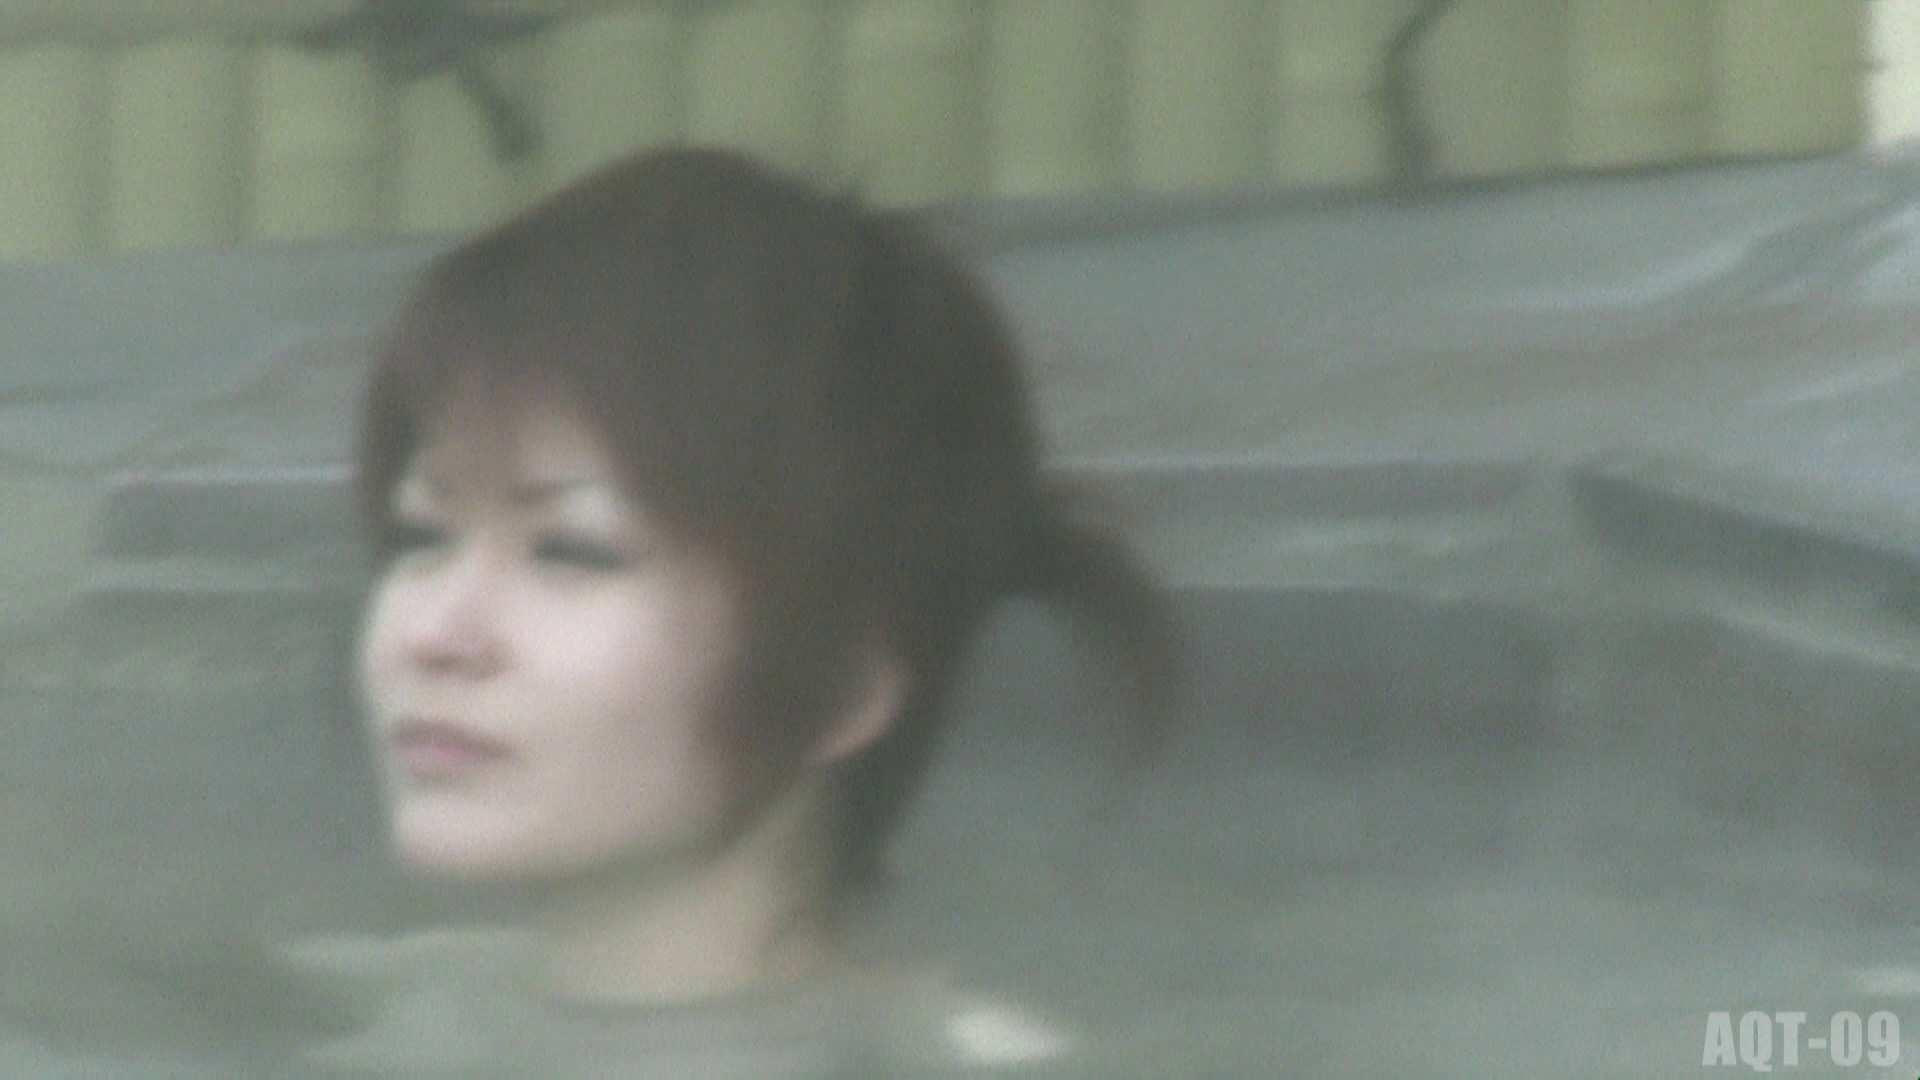 Aquaな露天風呂Vol.779 露天風呂編  99PIX 26